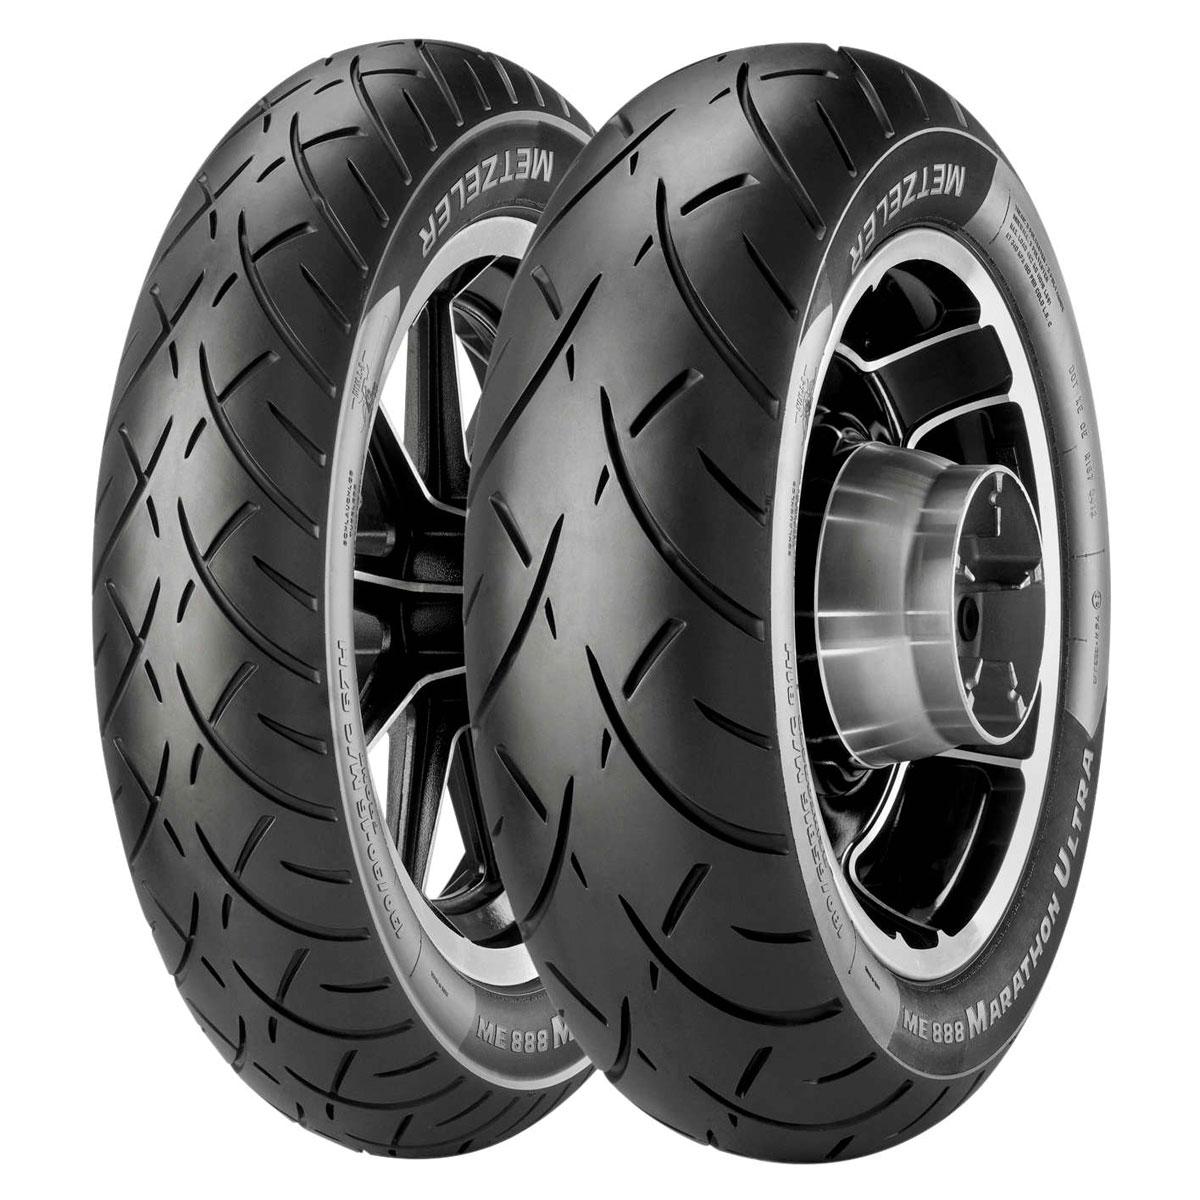 Metzeler ME888 Marathon Ultra 200/70B15 Rear Tire